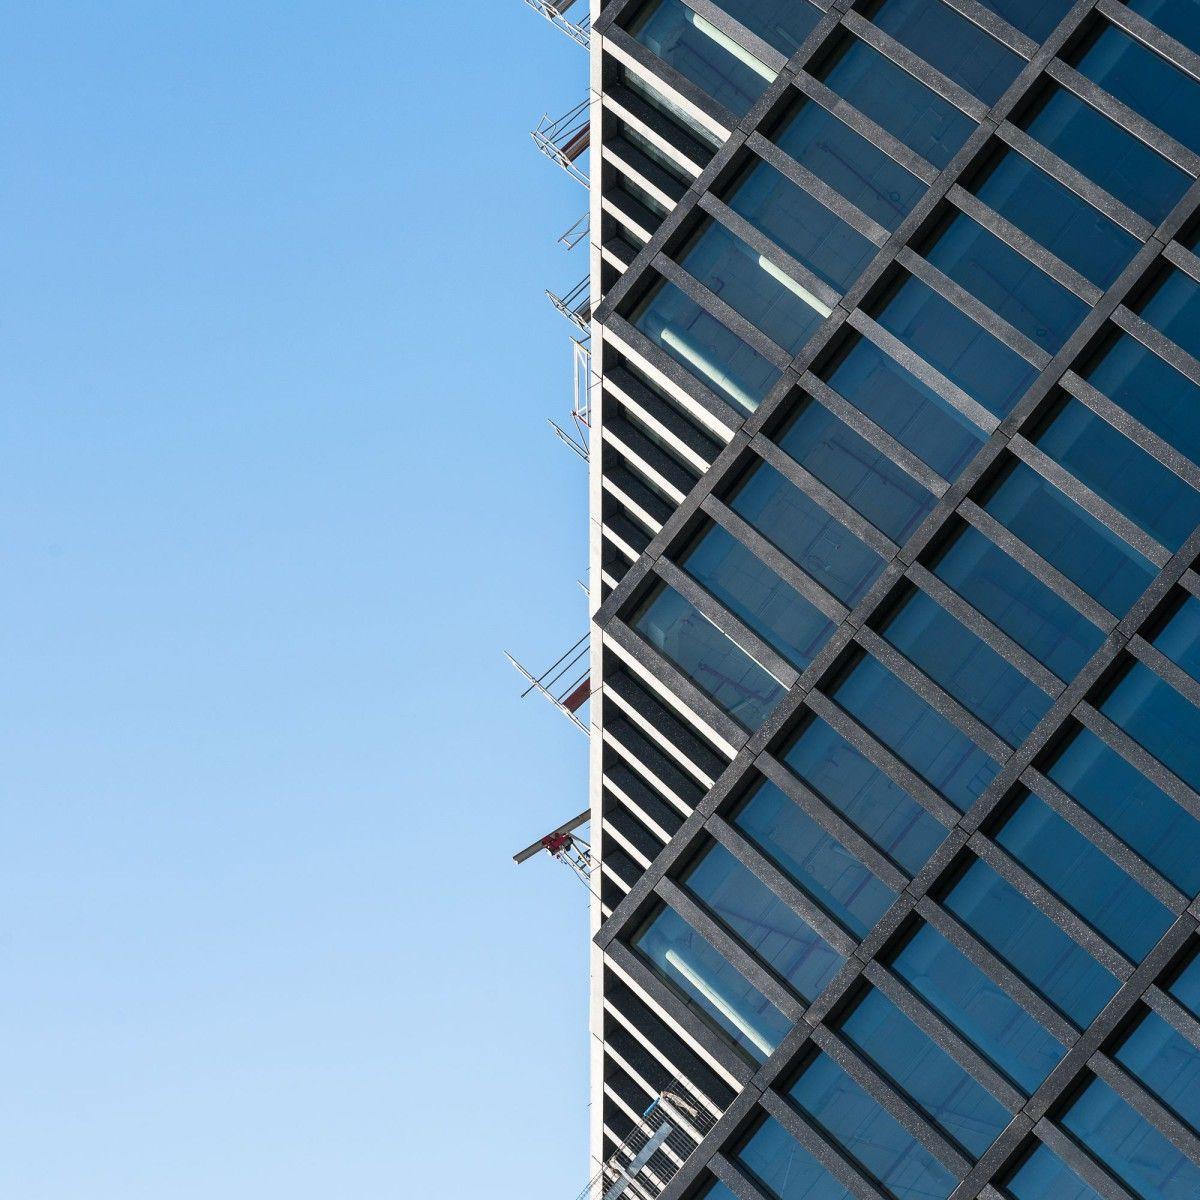 Mvrdv Ba Tyk Tower Poznan 7 Concept Pinterest Tower # Fontenla Muebles Hudson